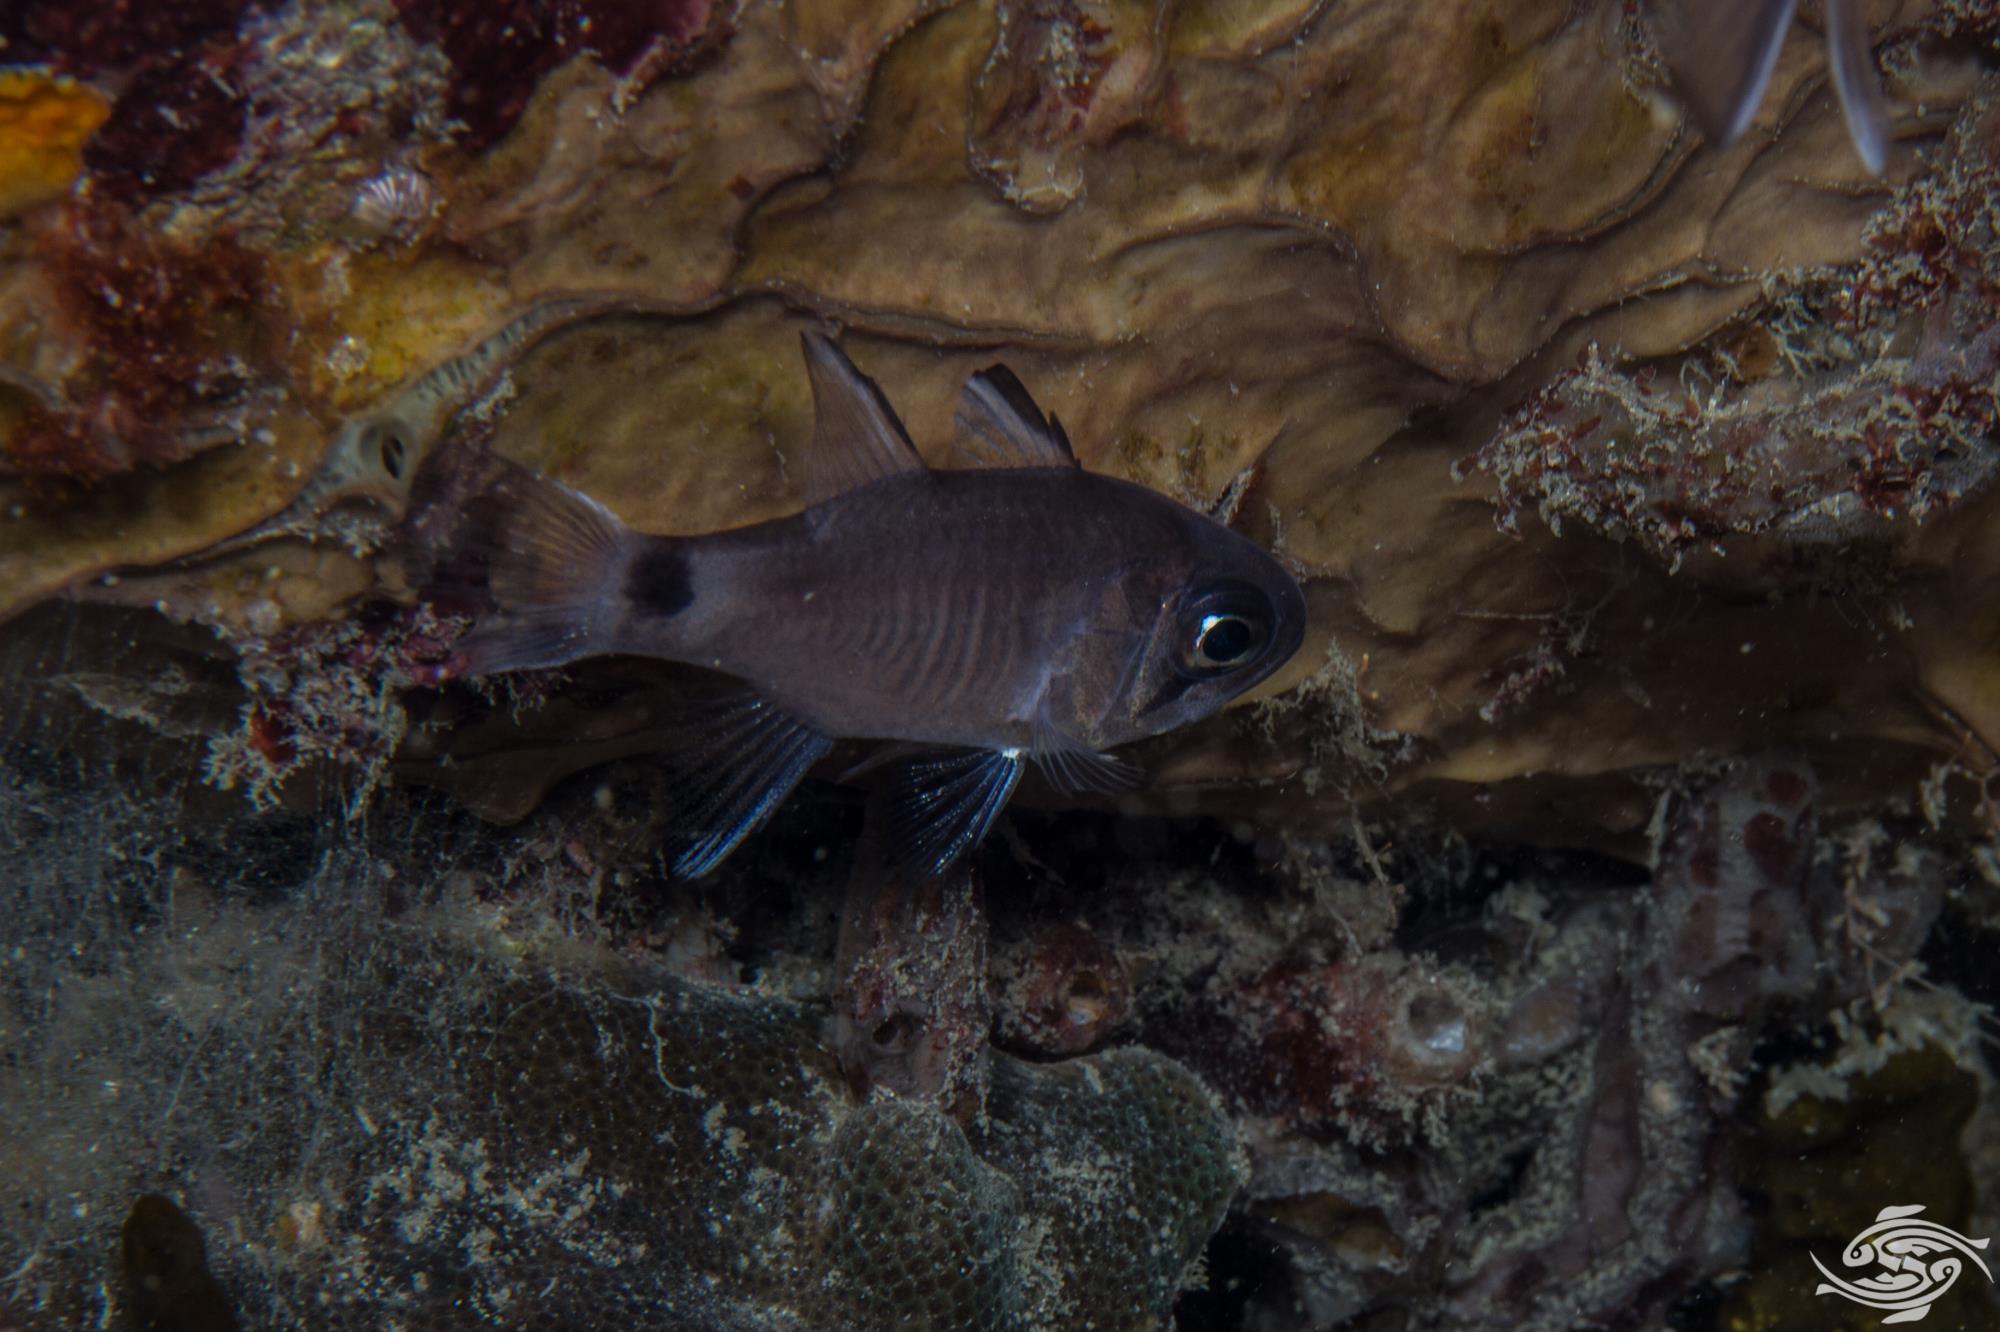 Samoan cardinalfish Nectamia savayensis